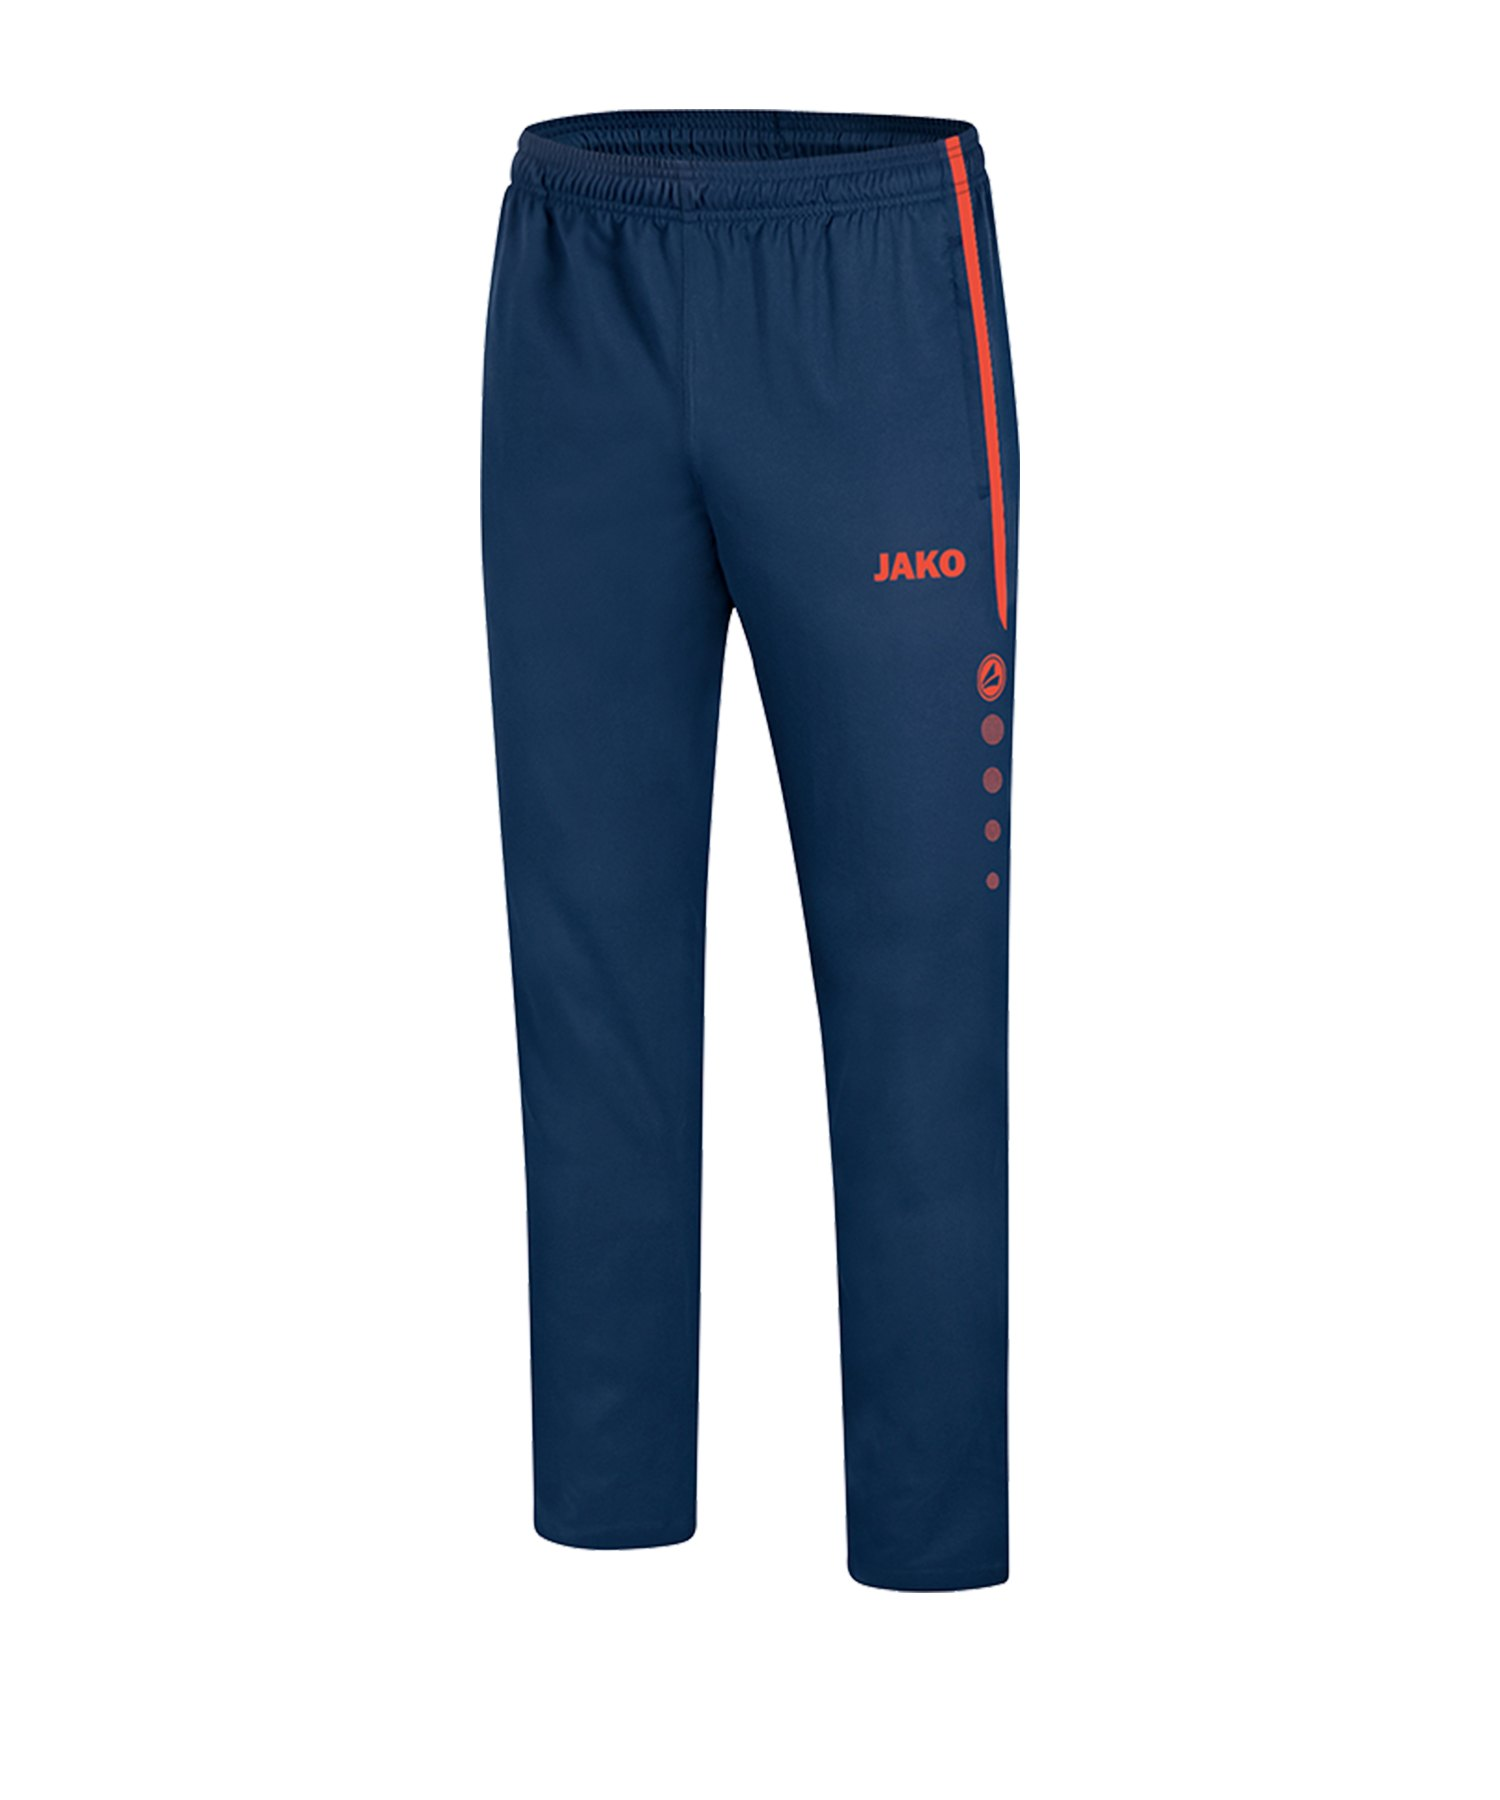 Jako Striker 2.0 Präsentationshose Damen Blau F18 - blau